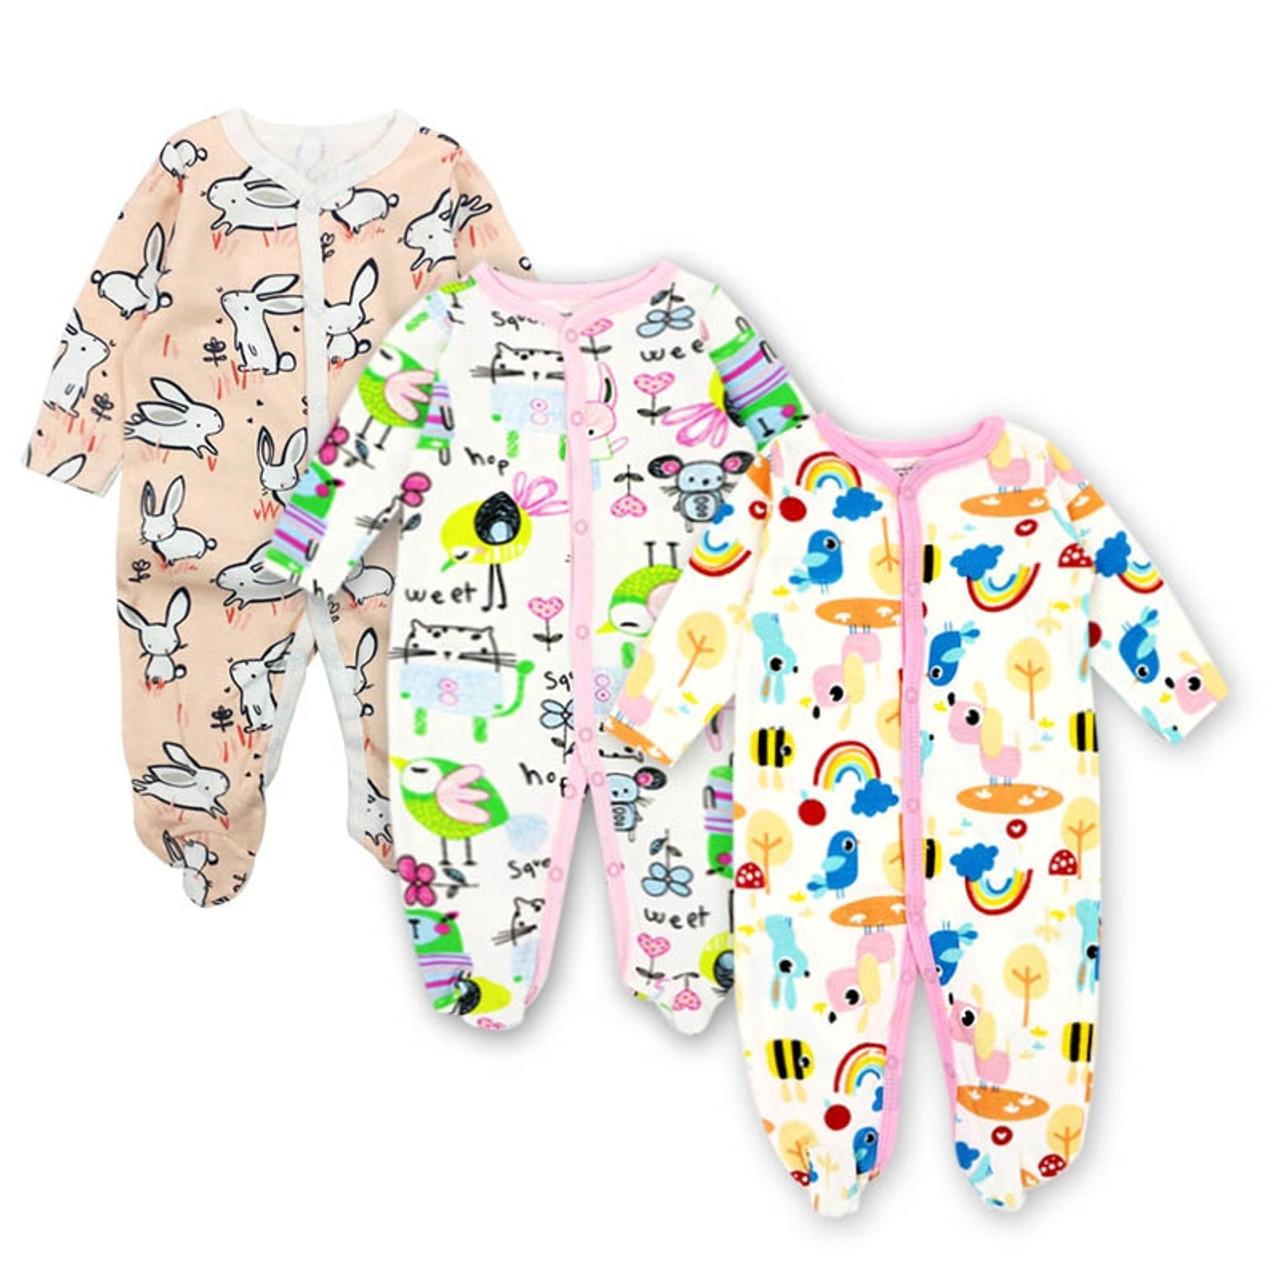 57c000c9b25b Baby Clothing Newborn jumpsuits Baby Boy Girl Romper Clothes Long ...